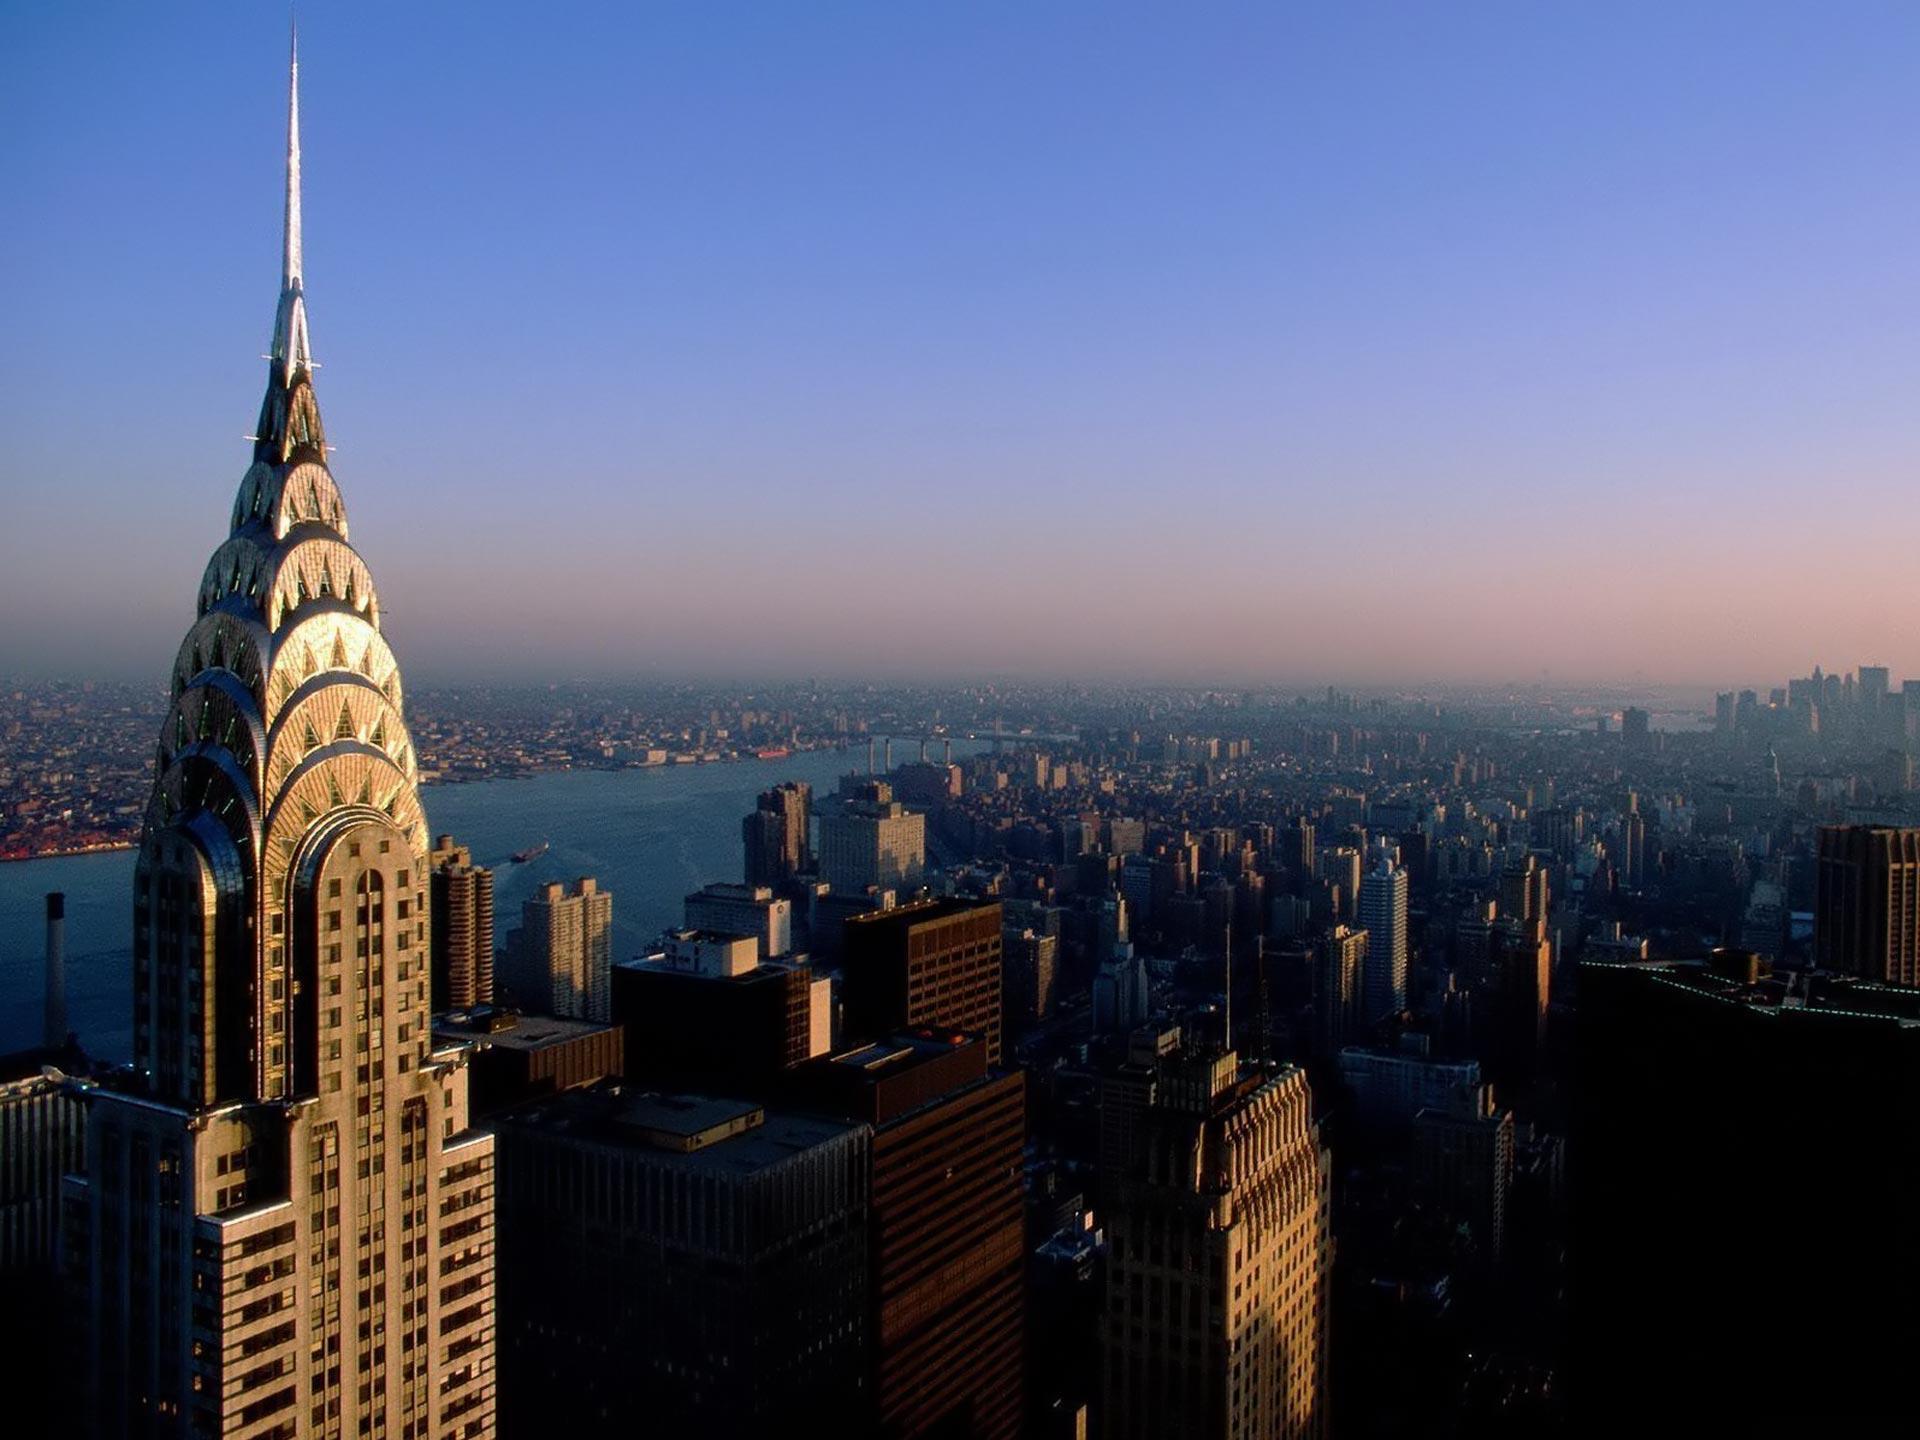 New York Wallpaper Hd on